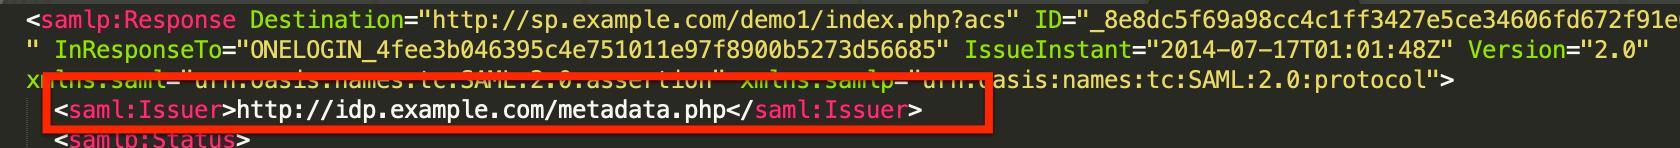 """Issuer"" in a SAML response"